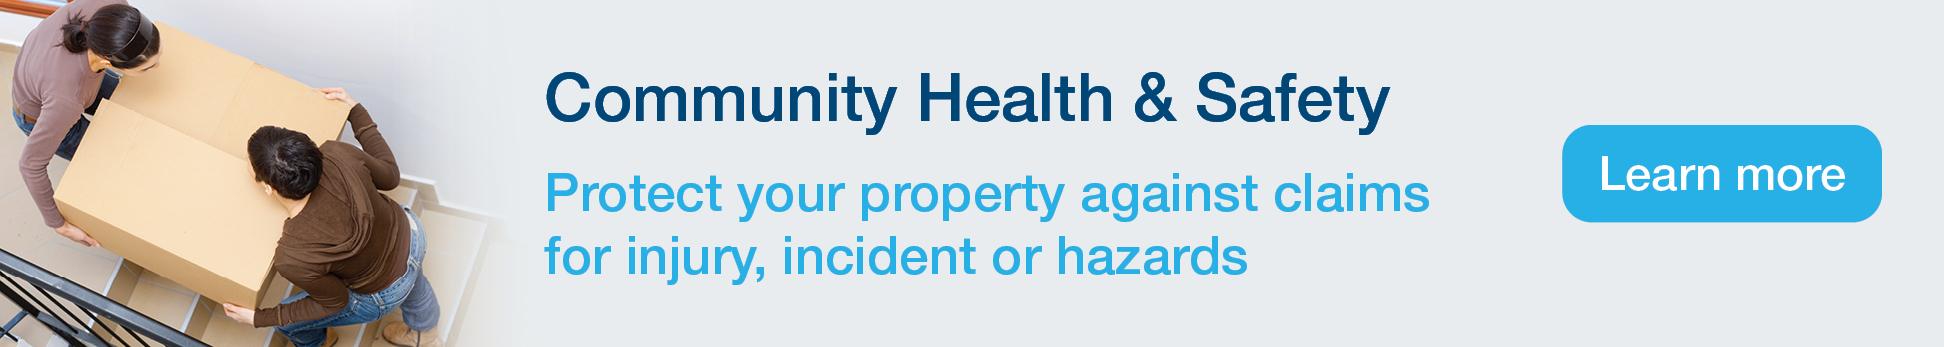 Community Health & Safety promo banner